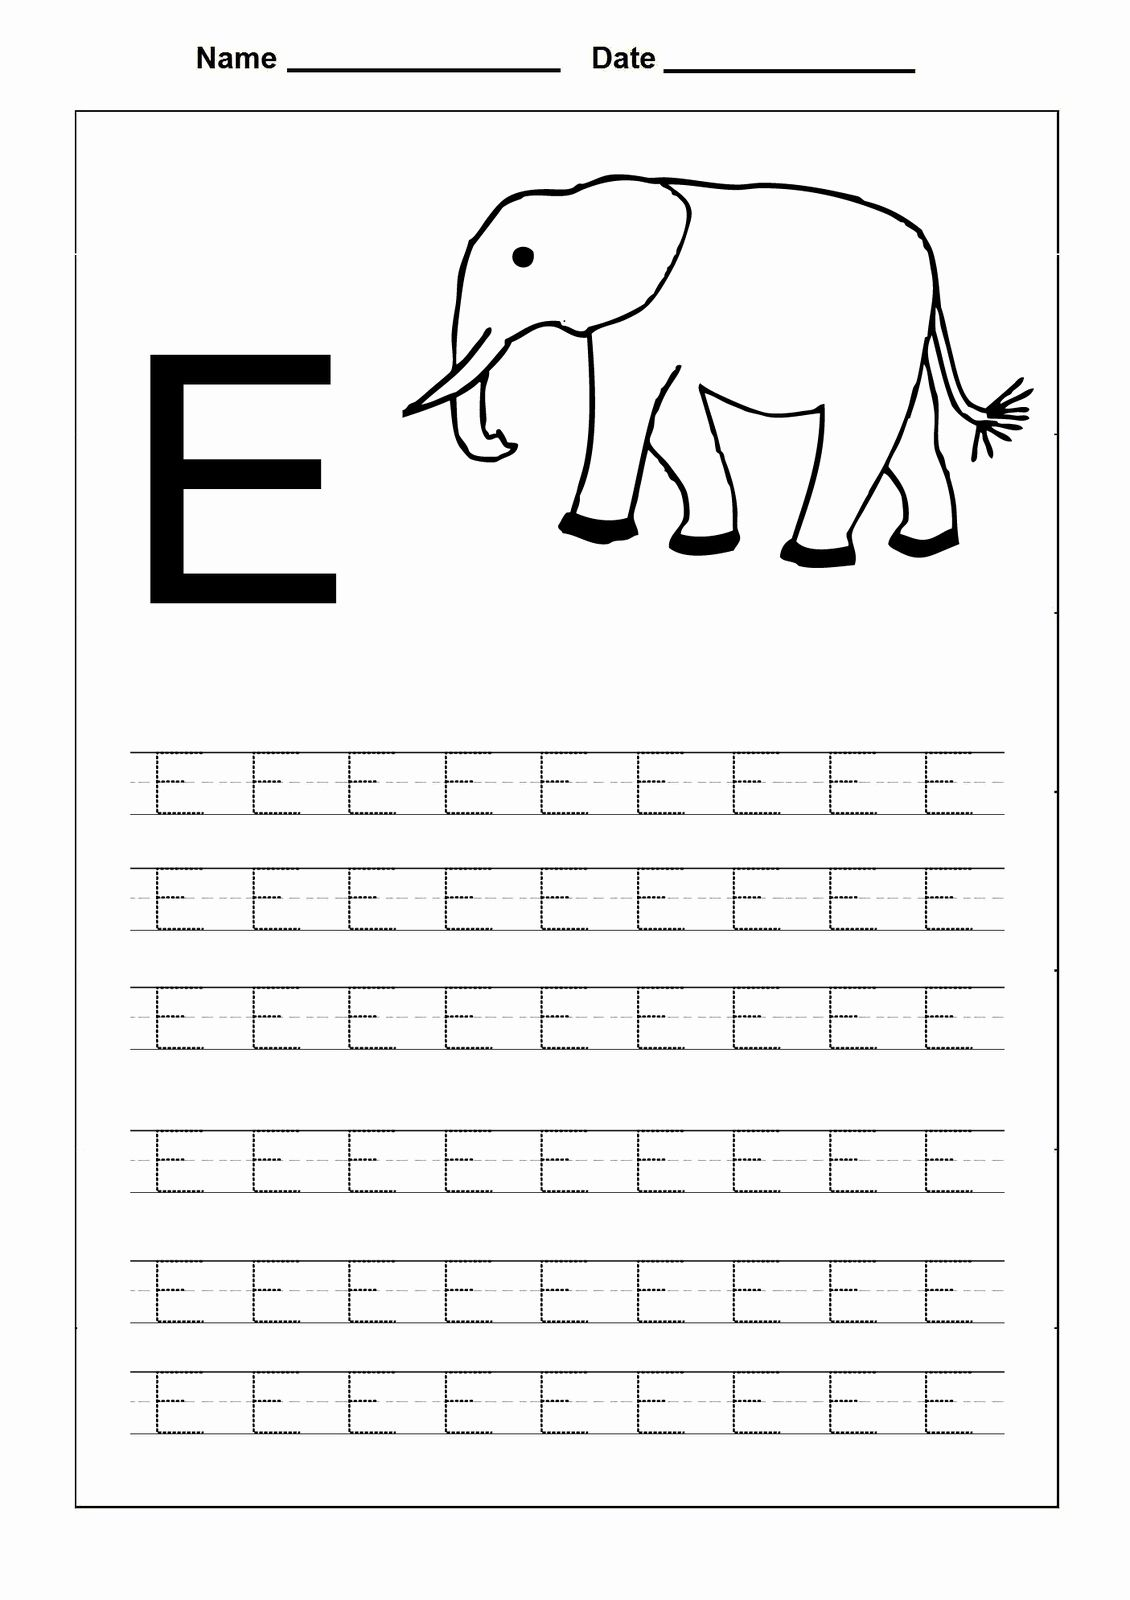 Alphabet Coloring Pages Twisty Noodle | Letter E Worksheets pertaining to Letter K Worksheets Twisty Noodle